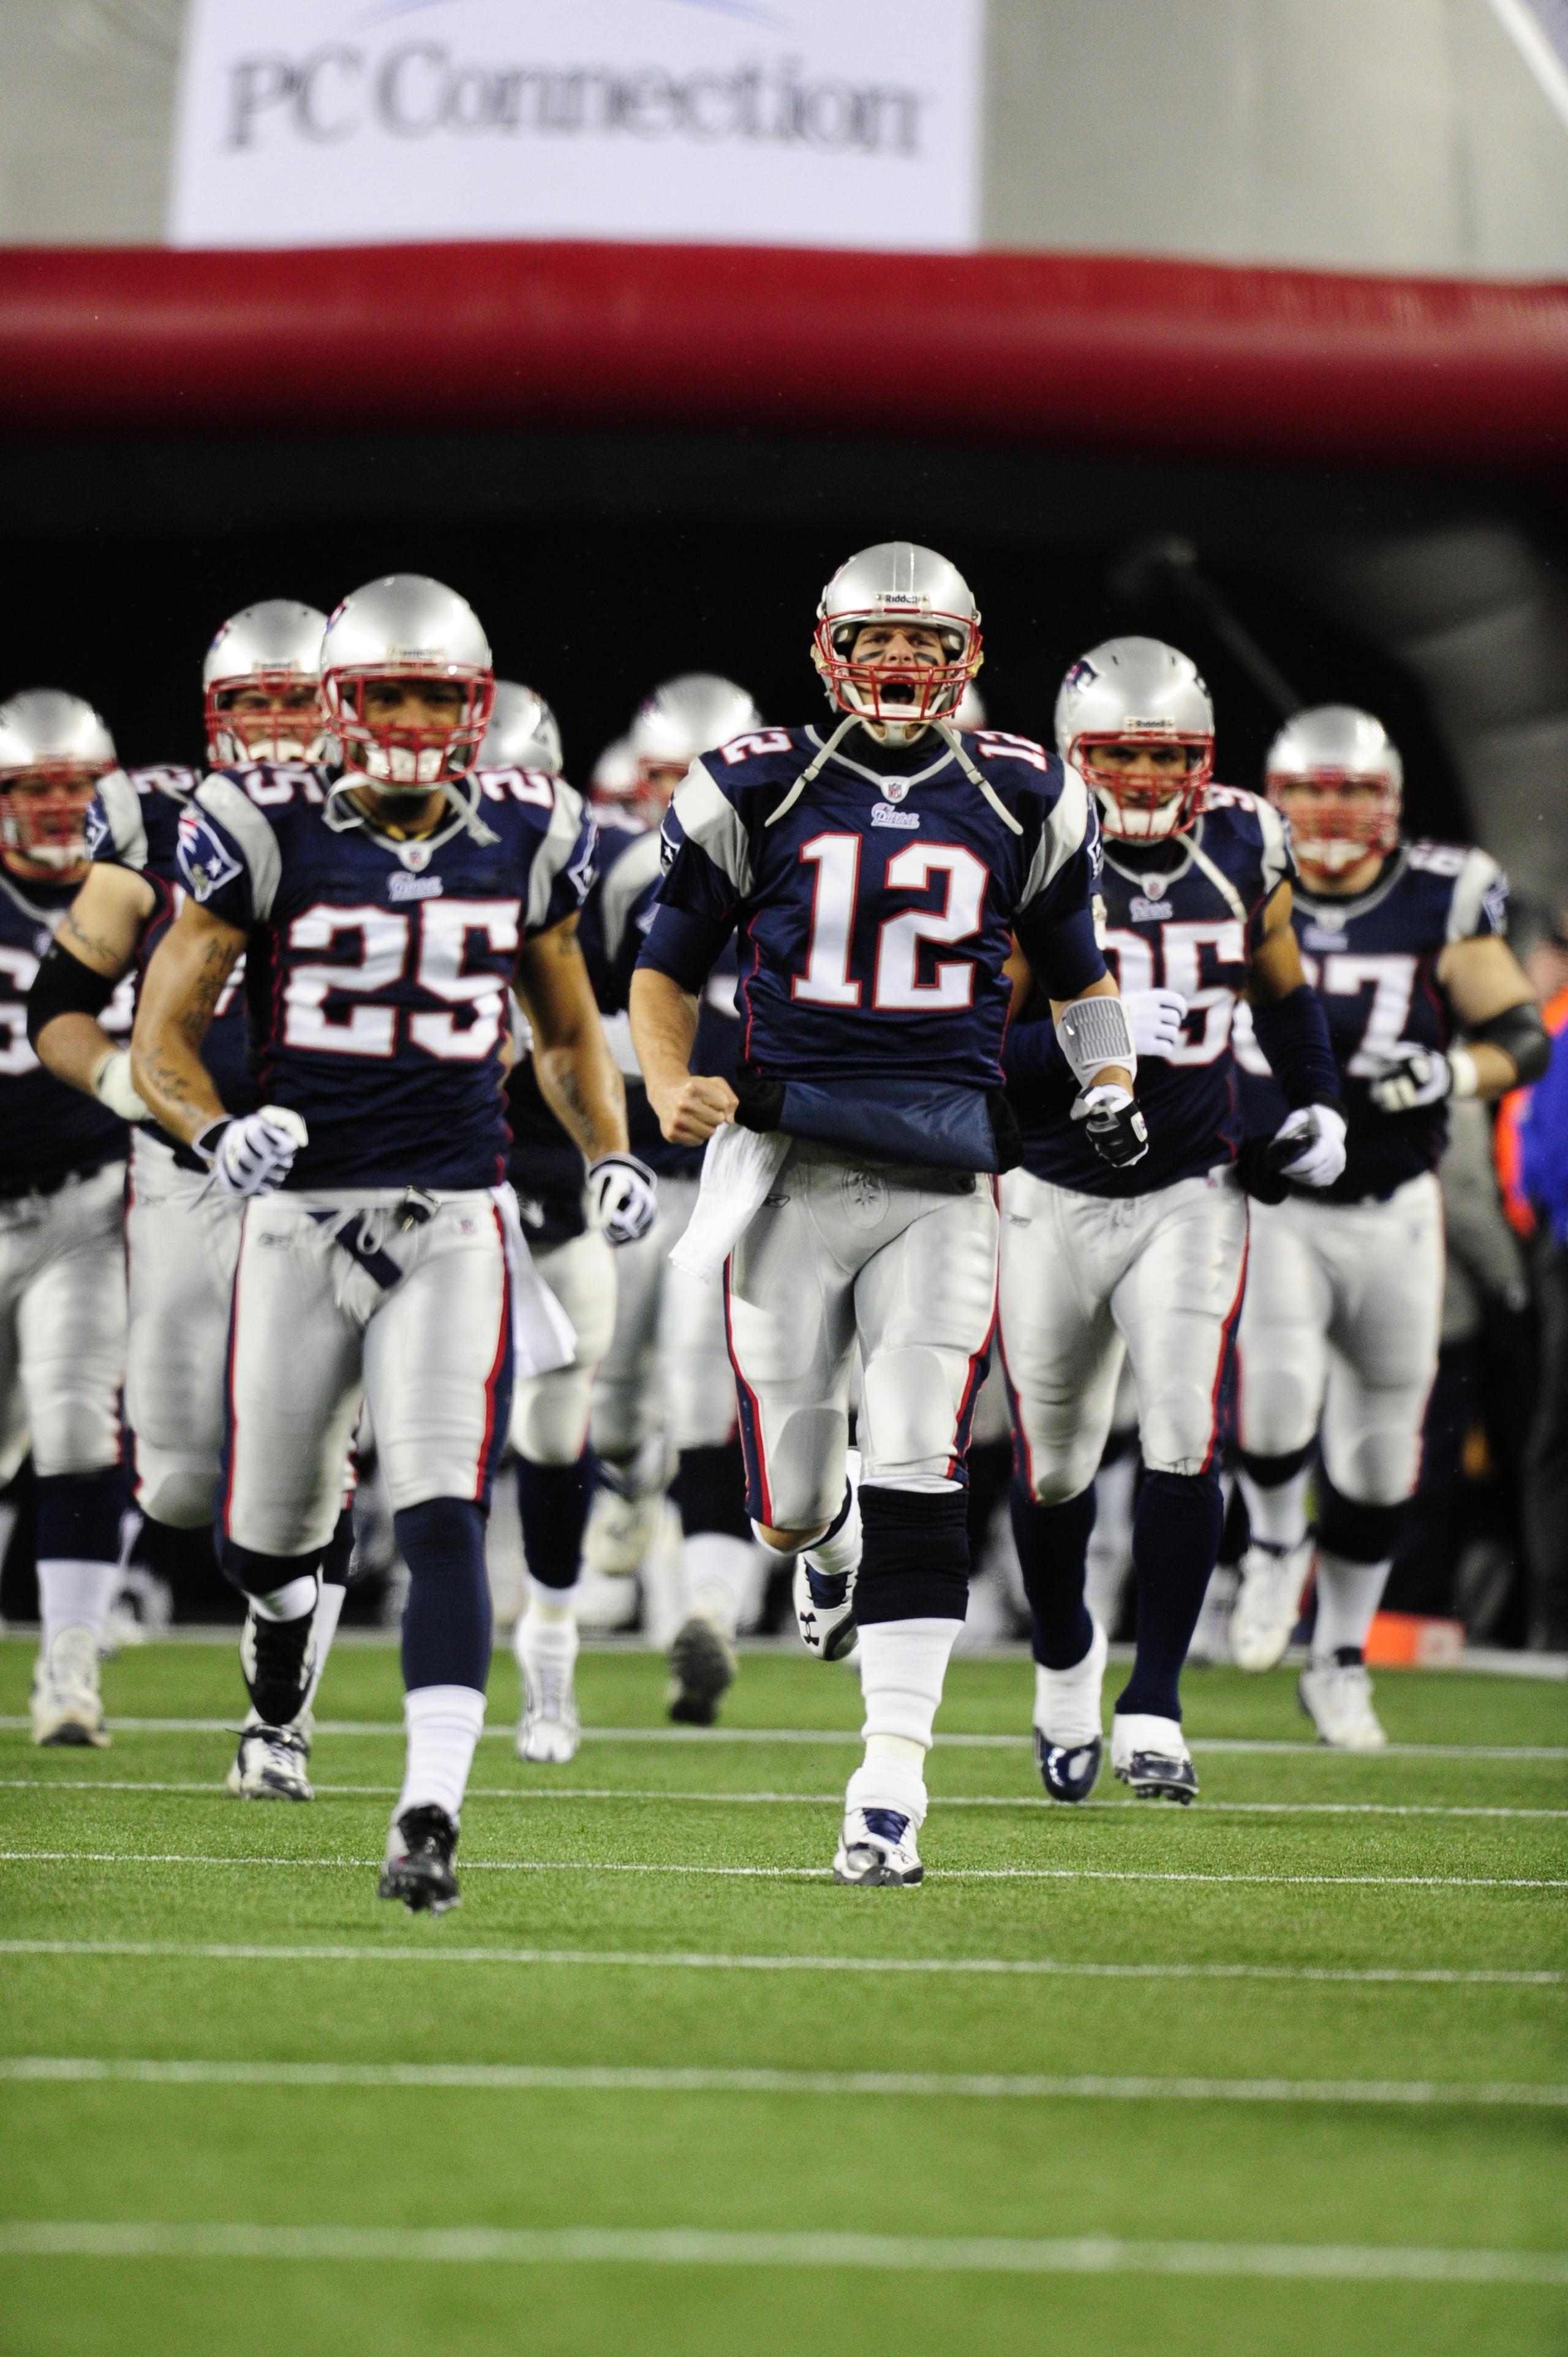 Bradynyj120610 Jm0058 Jpg 2 560 3 847 Pixels New England Patriots Patriots Team New England Patriots Football